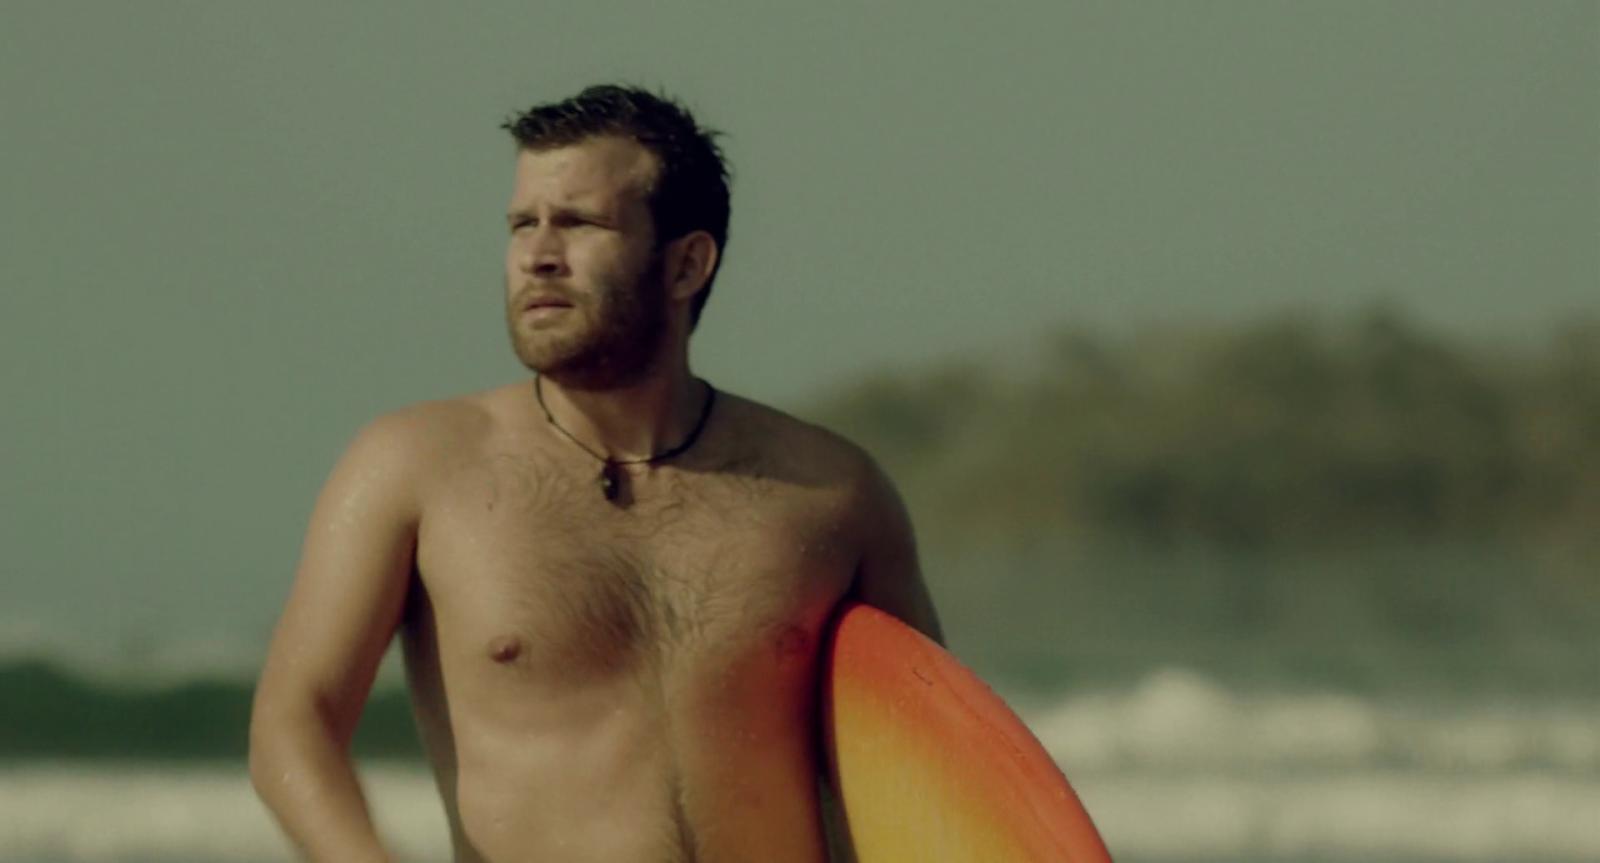 Shirtless Men On The Blog: Paolo Bovani Shirtless